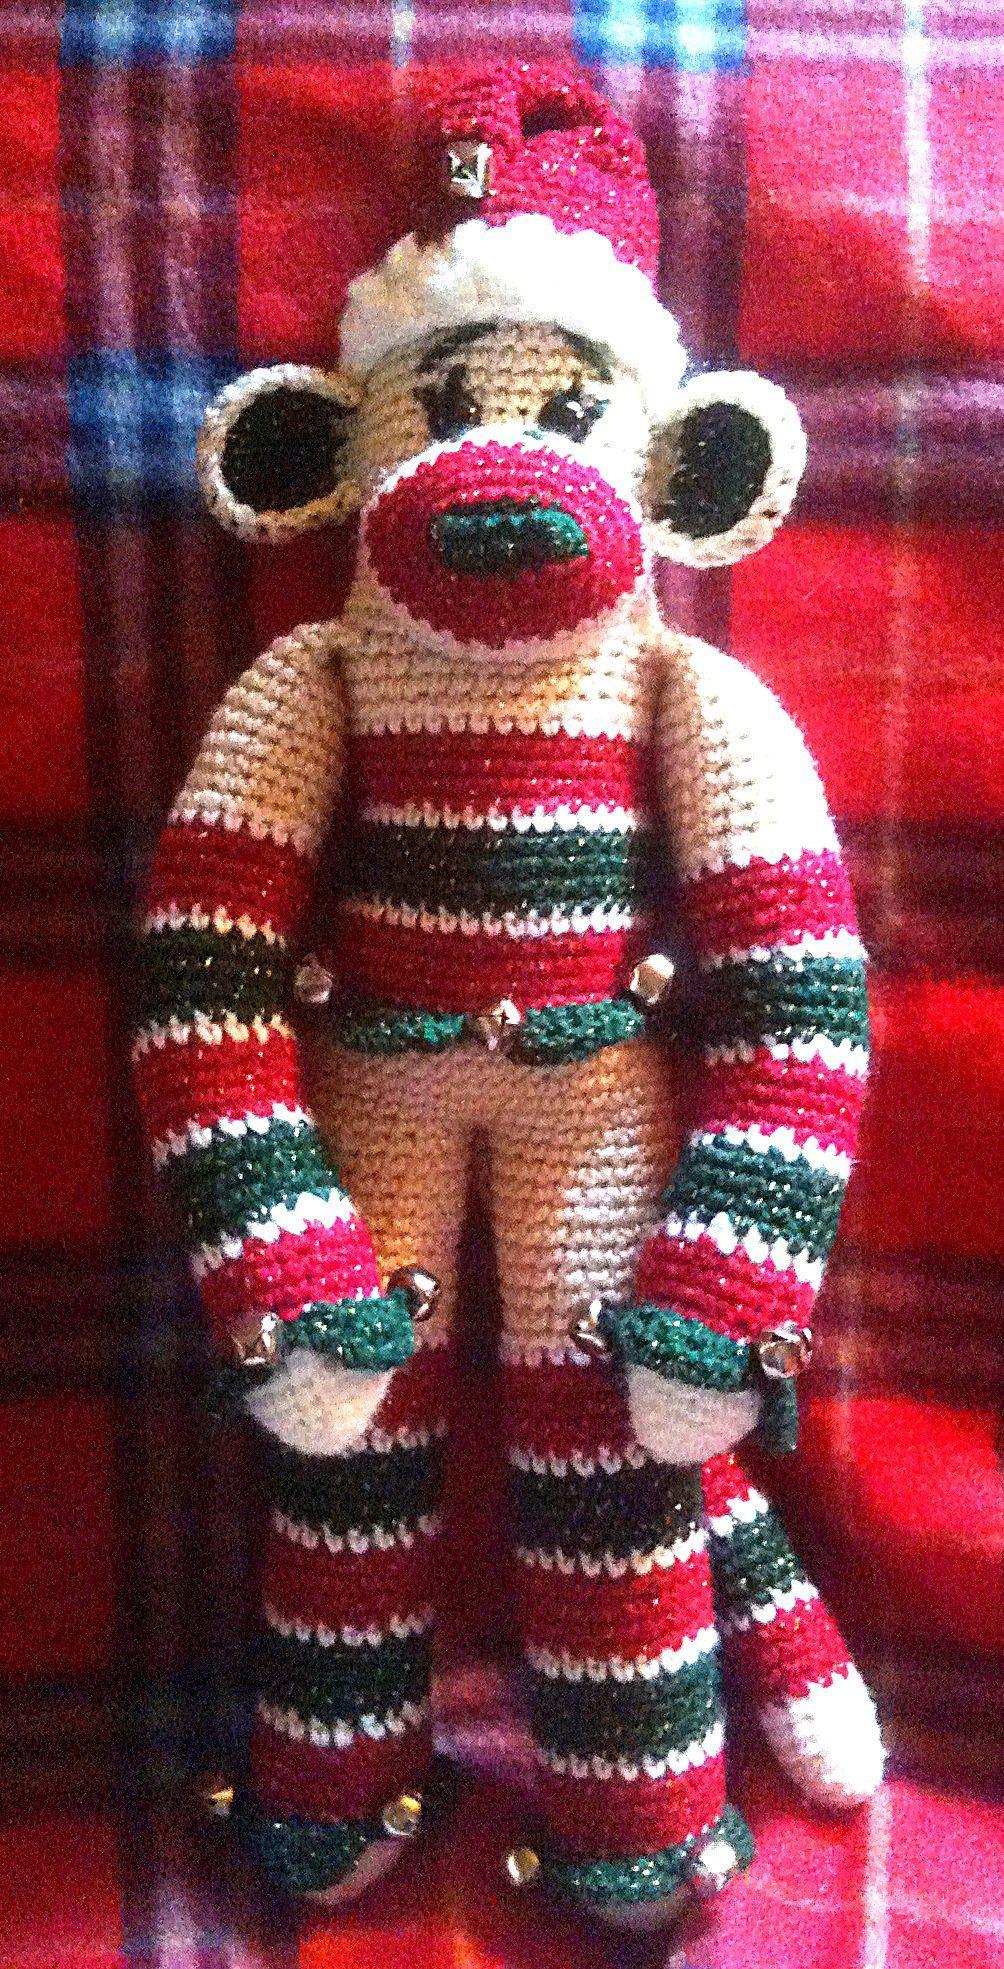 Jingle jangle sock monkey | My crochet work | Pinterest | Monkey ...